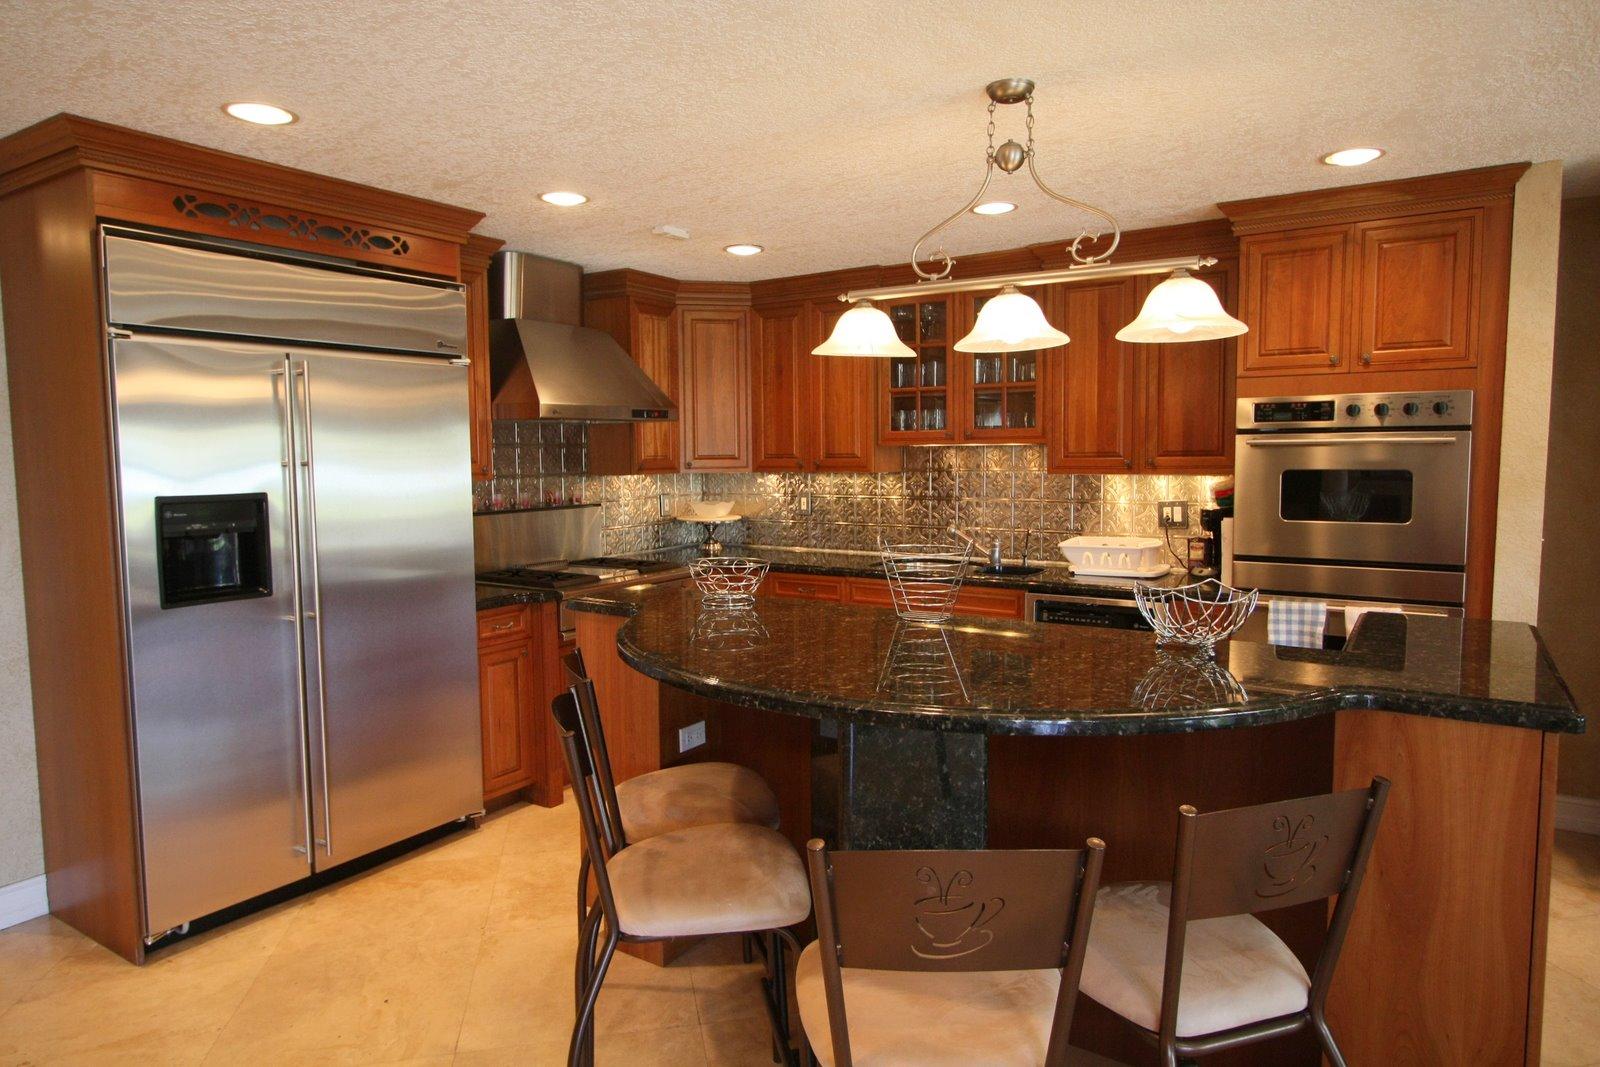 Kitchen Remodeling Idea 4